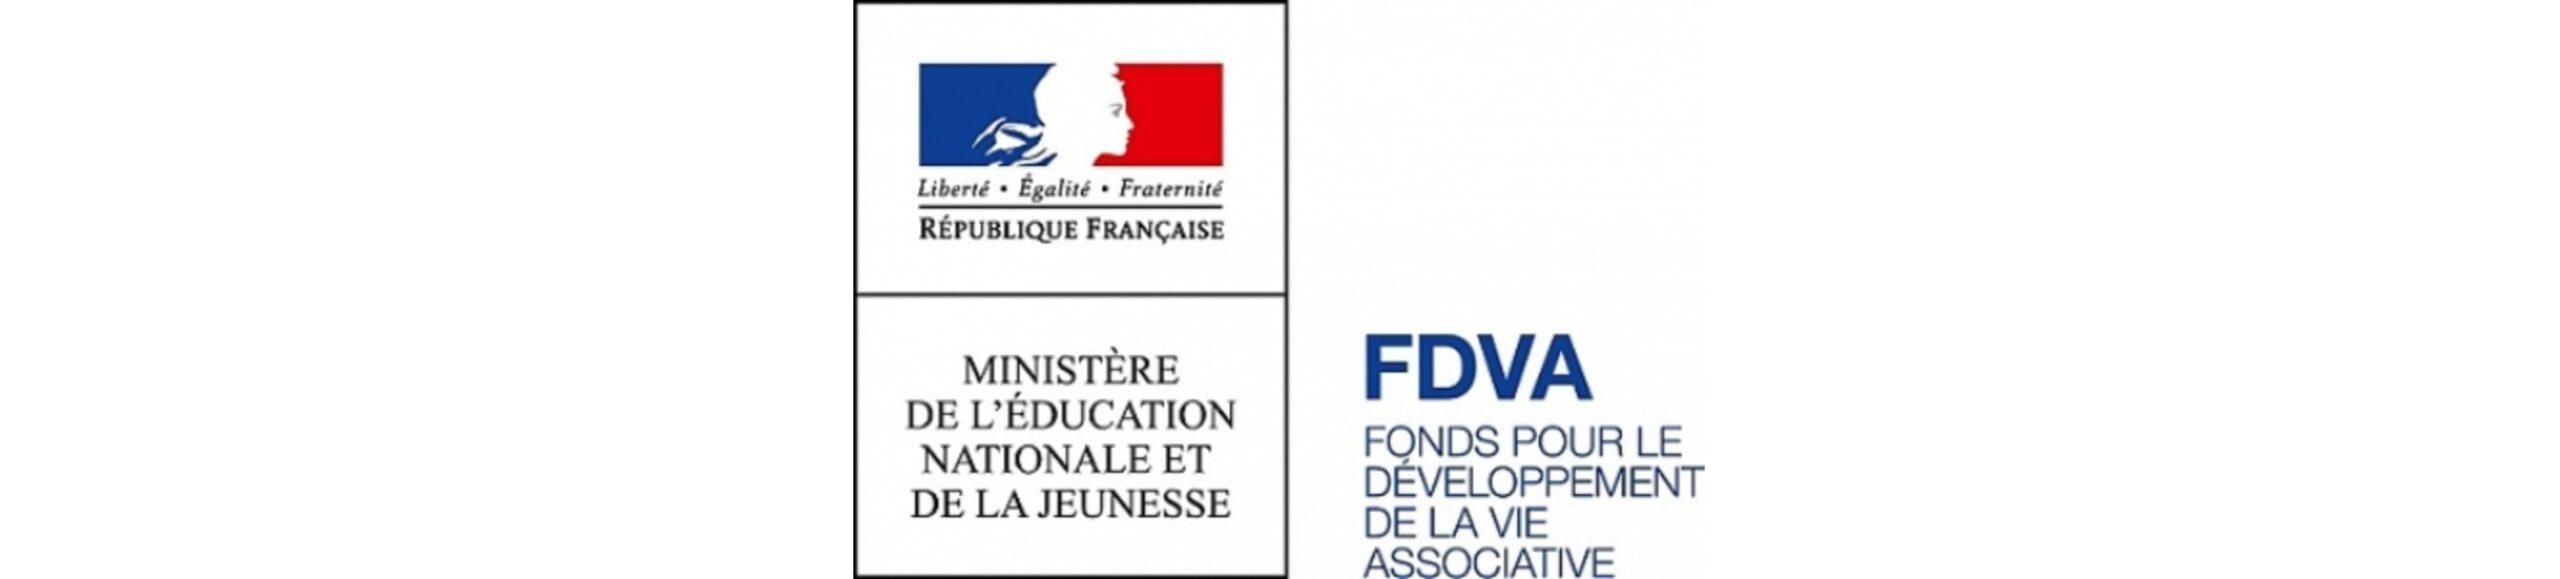 Logo FVDA